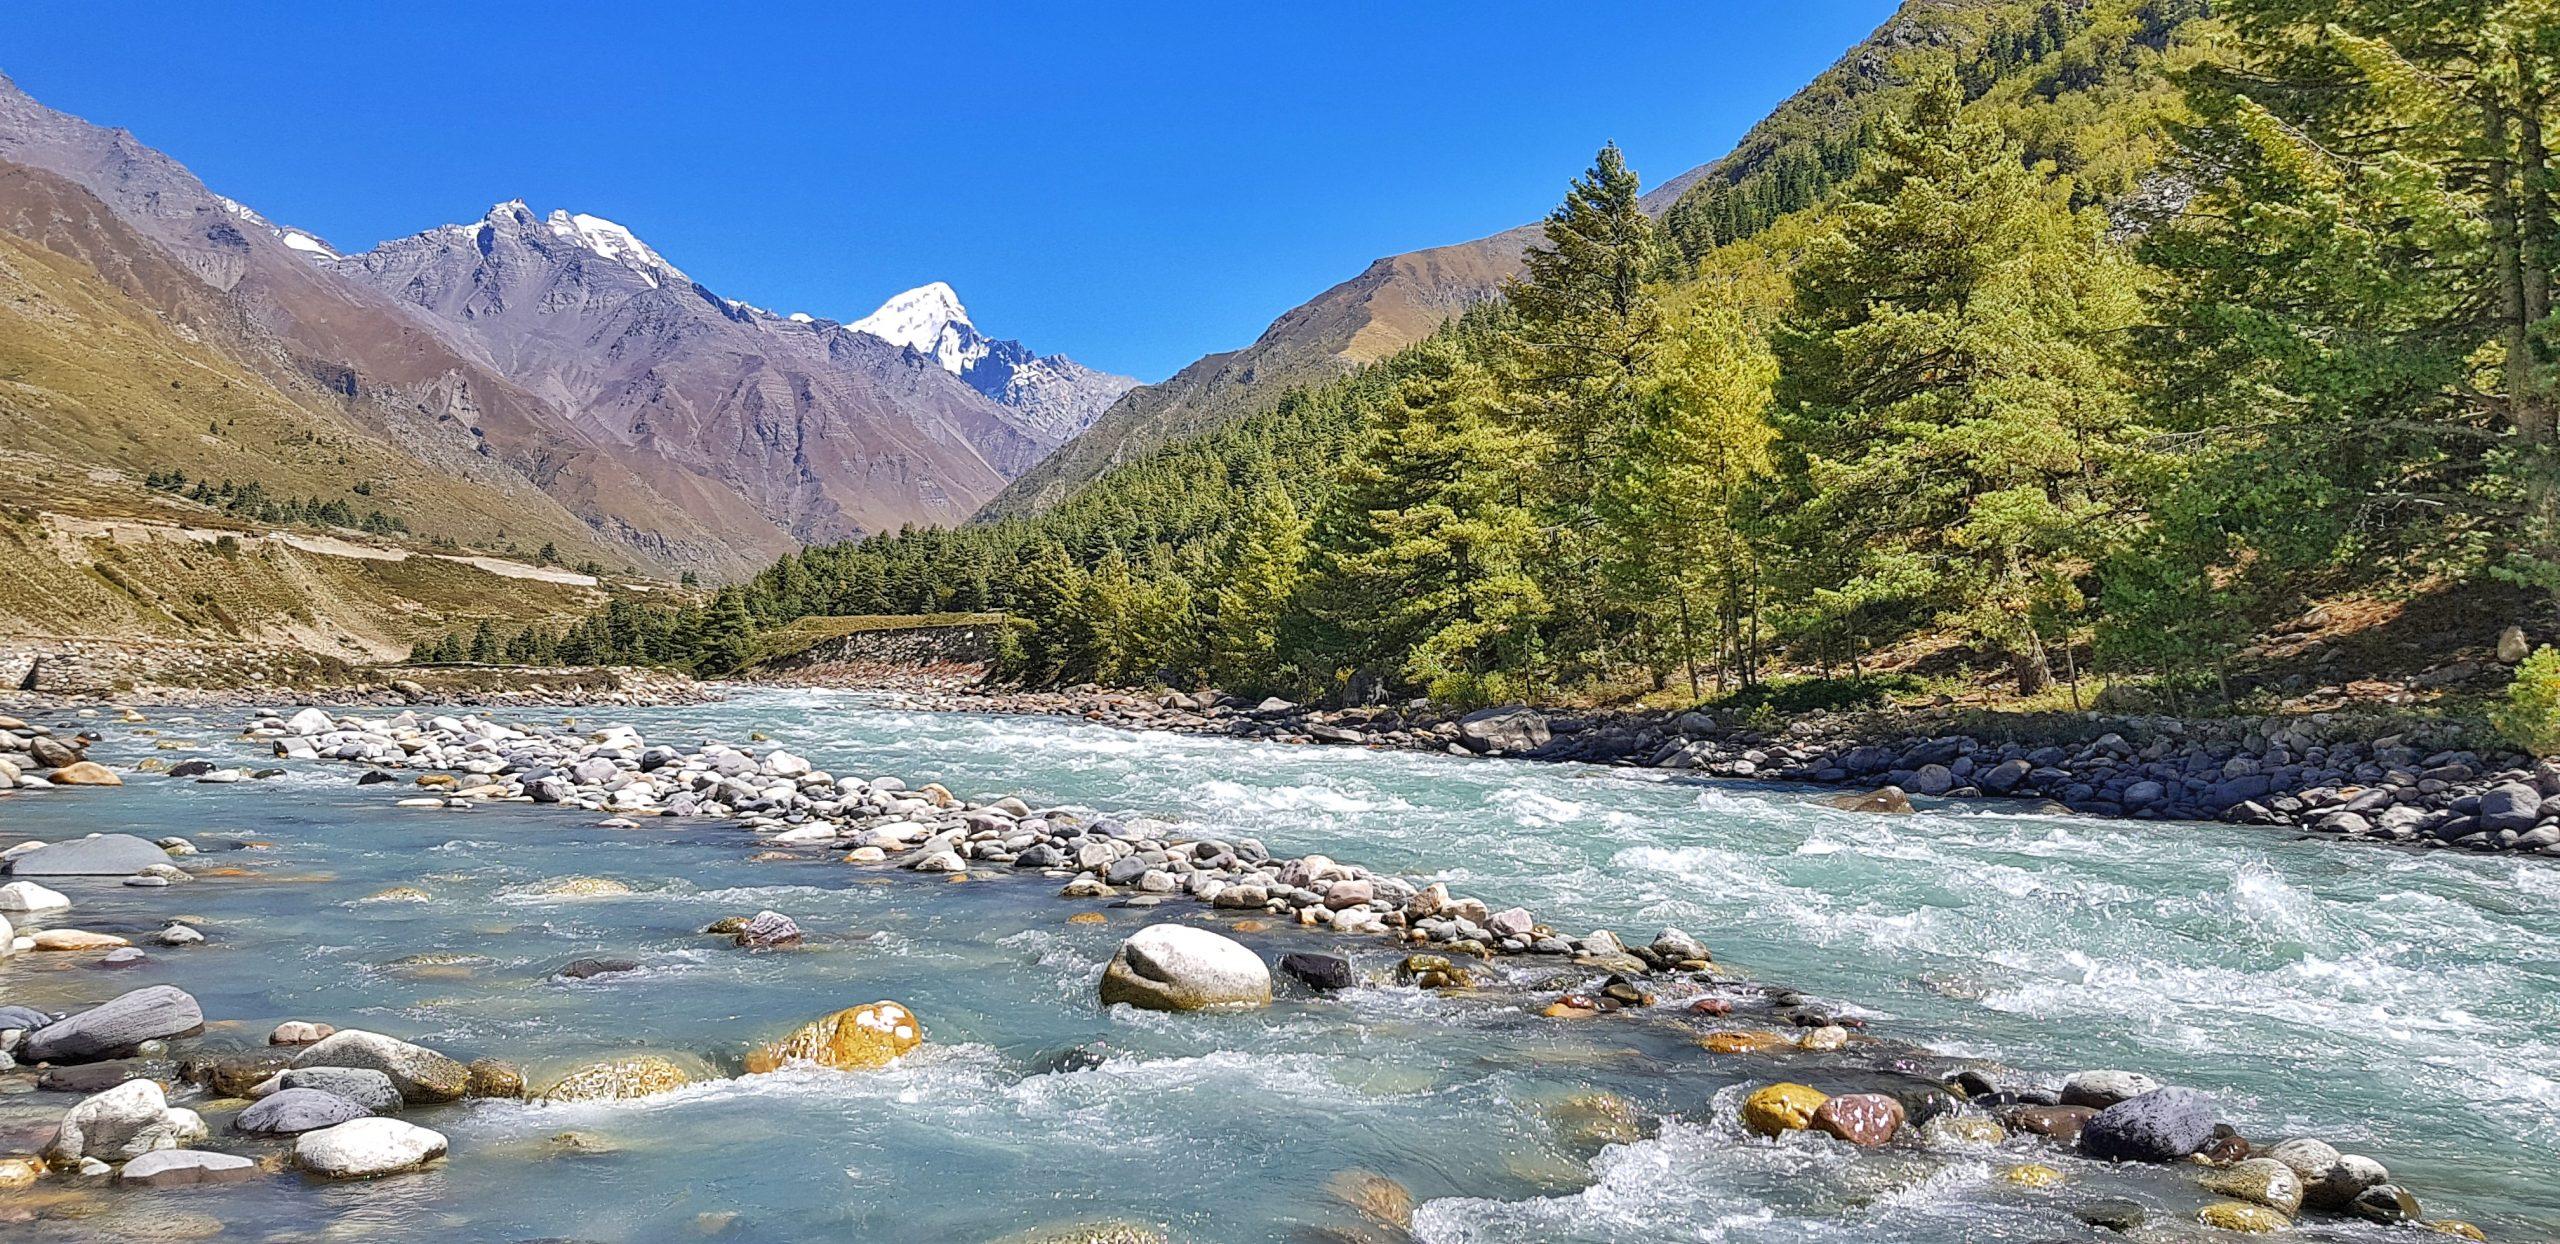 Baspa river flowing through Chitkul